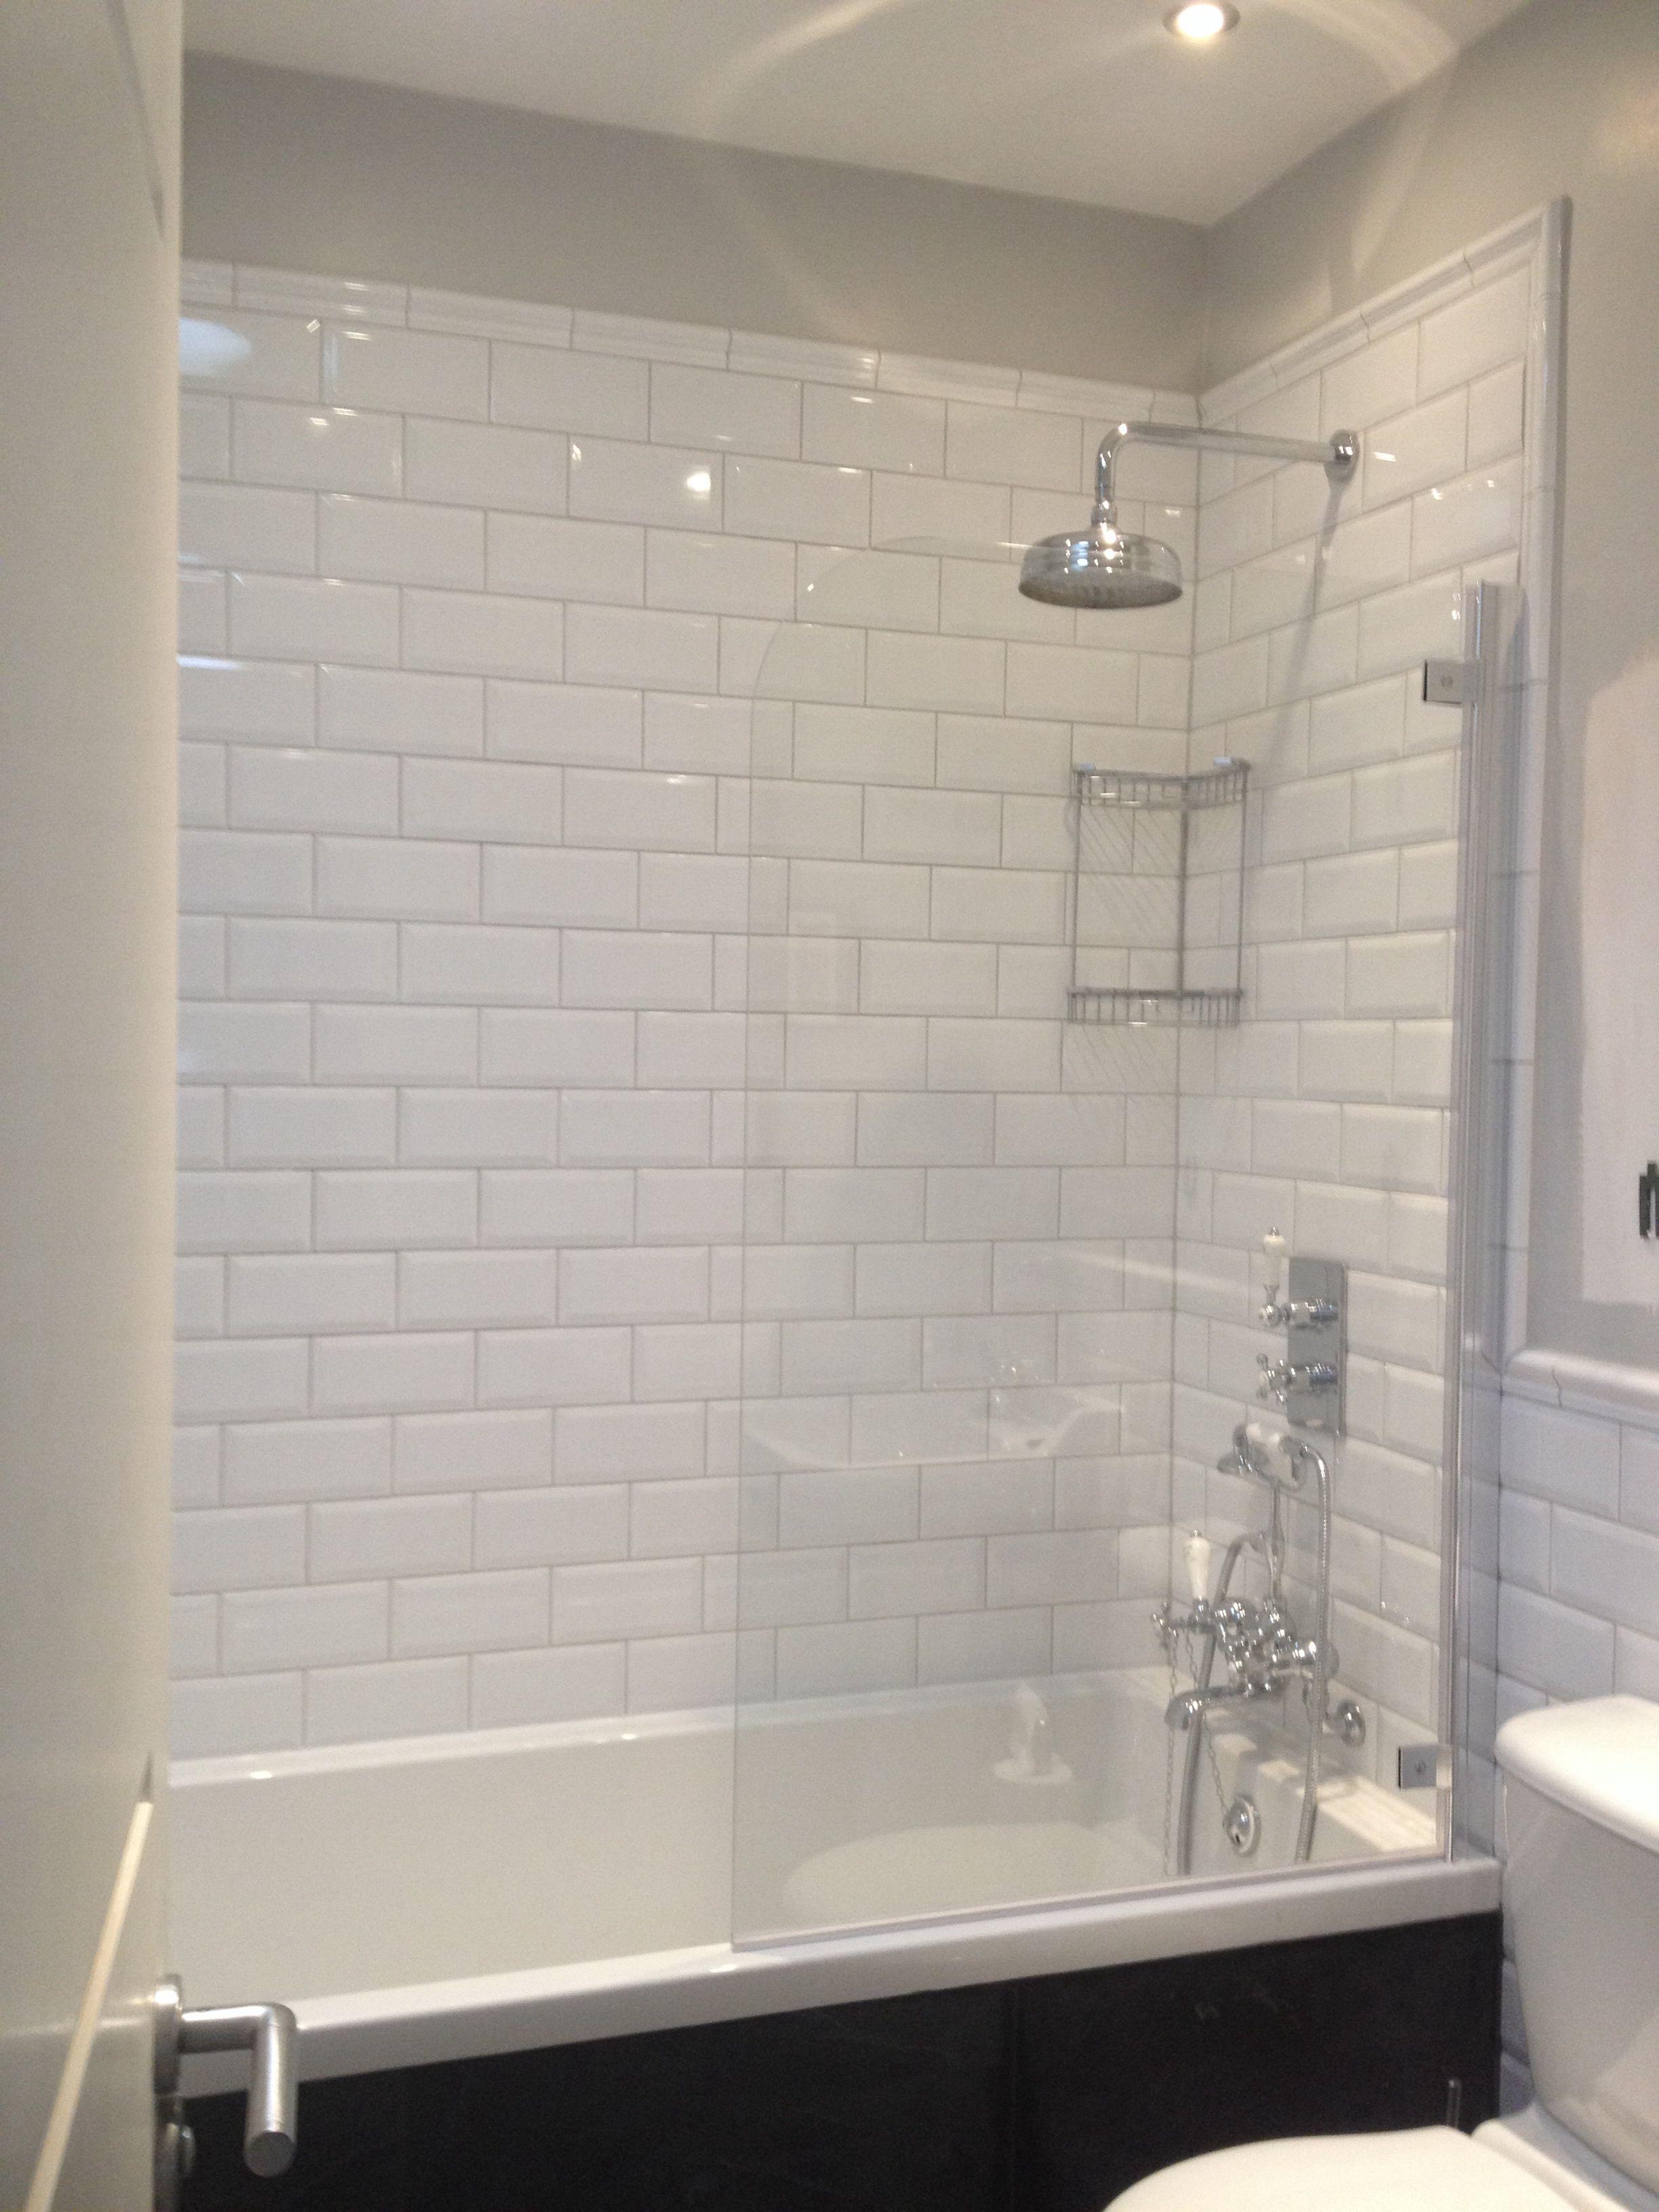 viola subway tiles with dado border bathrooms. Black Bedroom Furniture Sets. Home Design Ideas